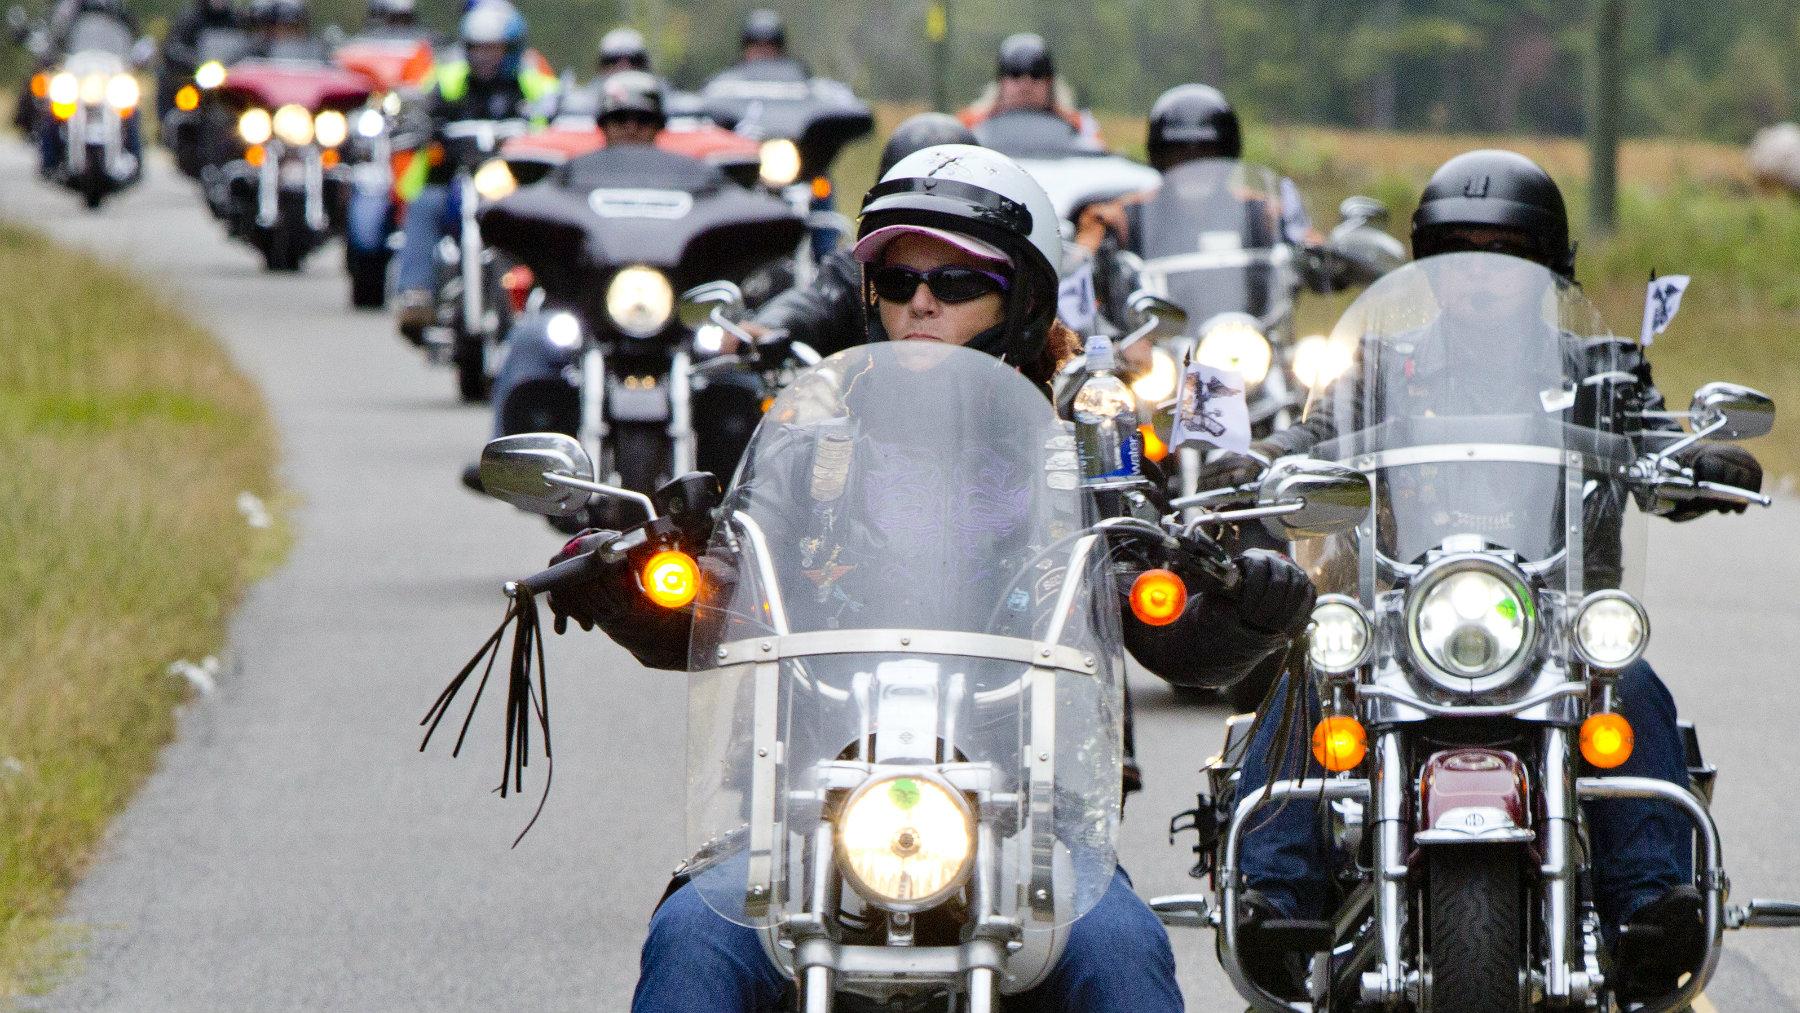 Riders participate in a Harley-Davidson service event.